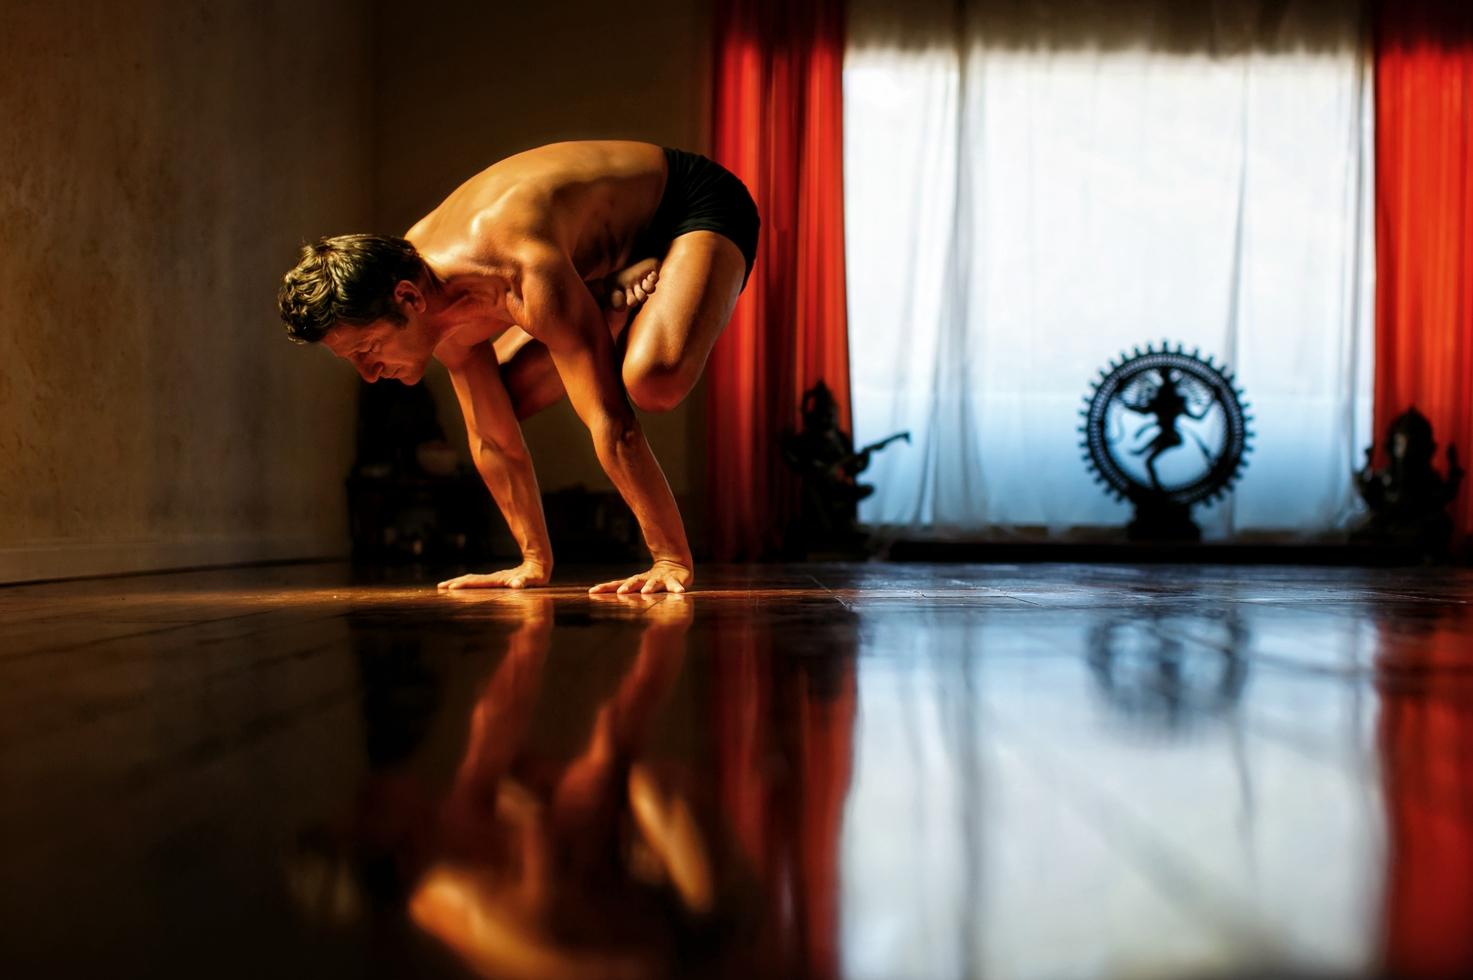 tony_g_yoga_02_retouch.jpg